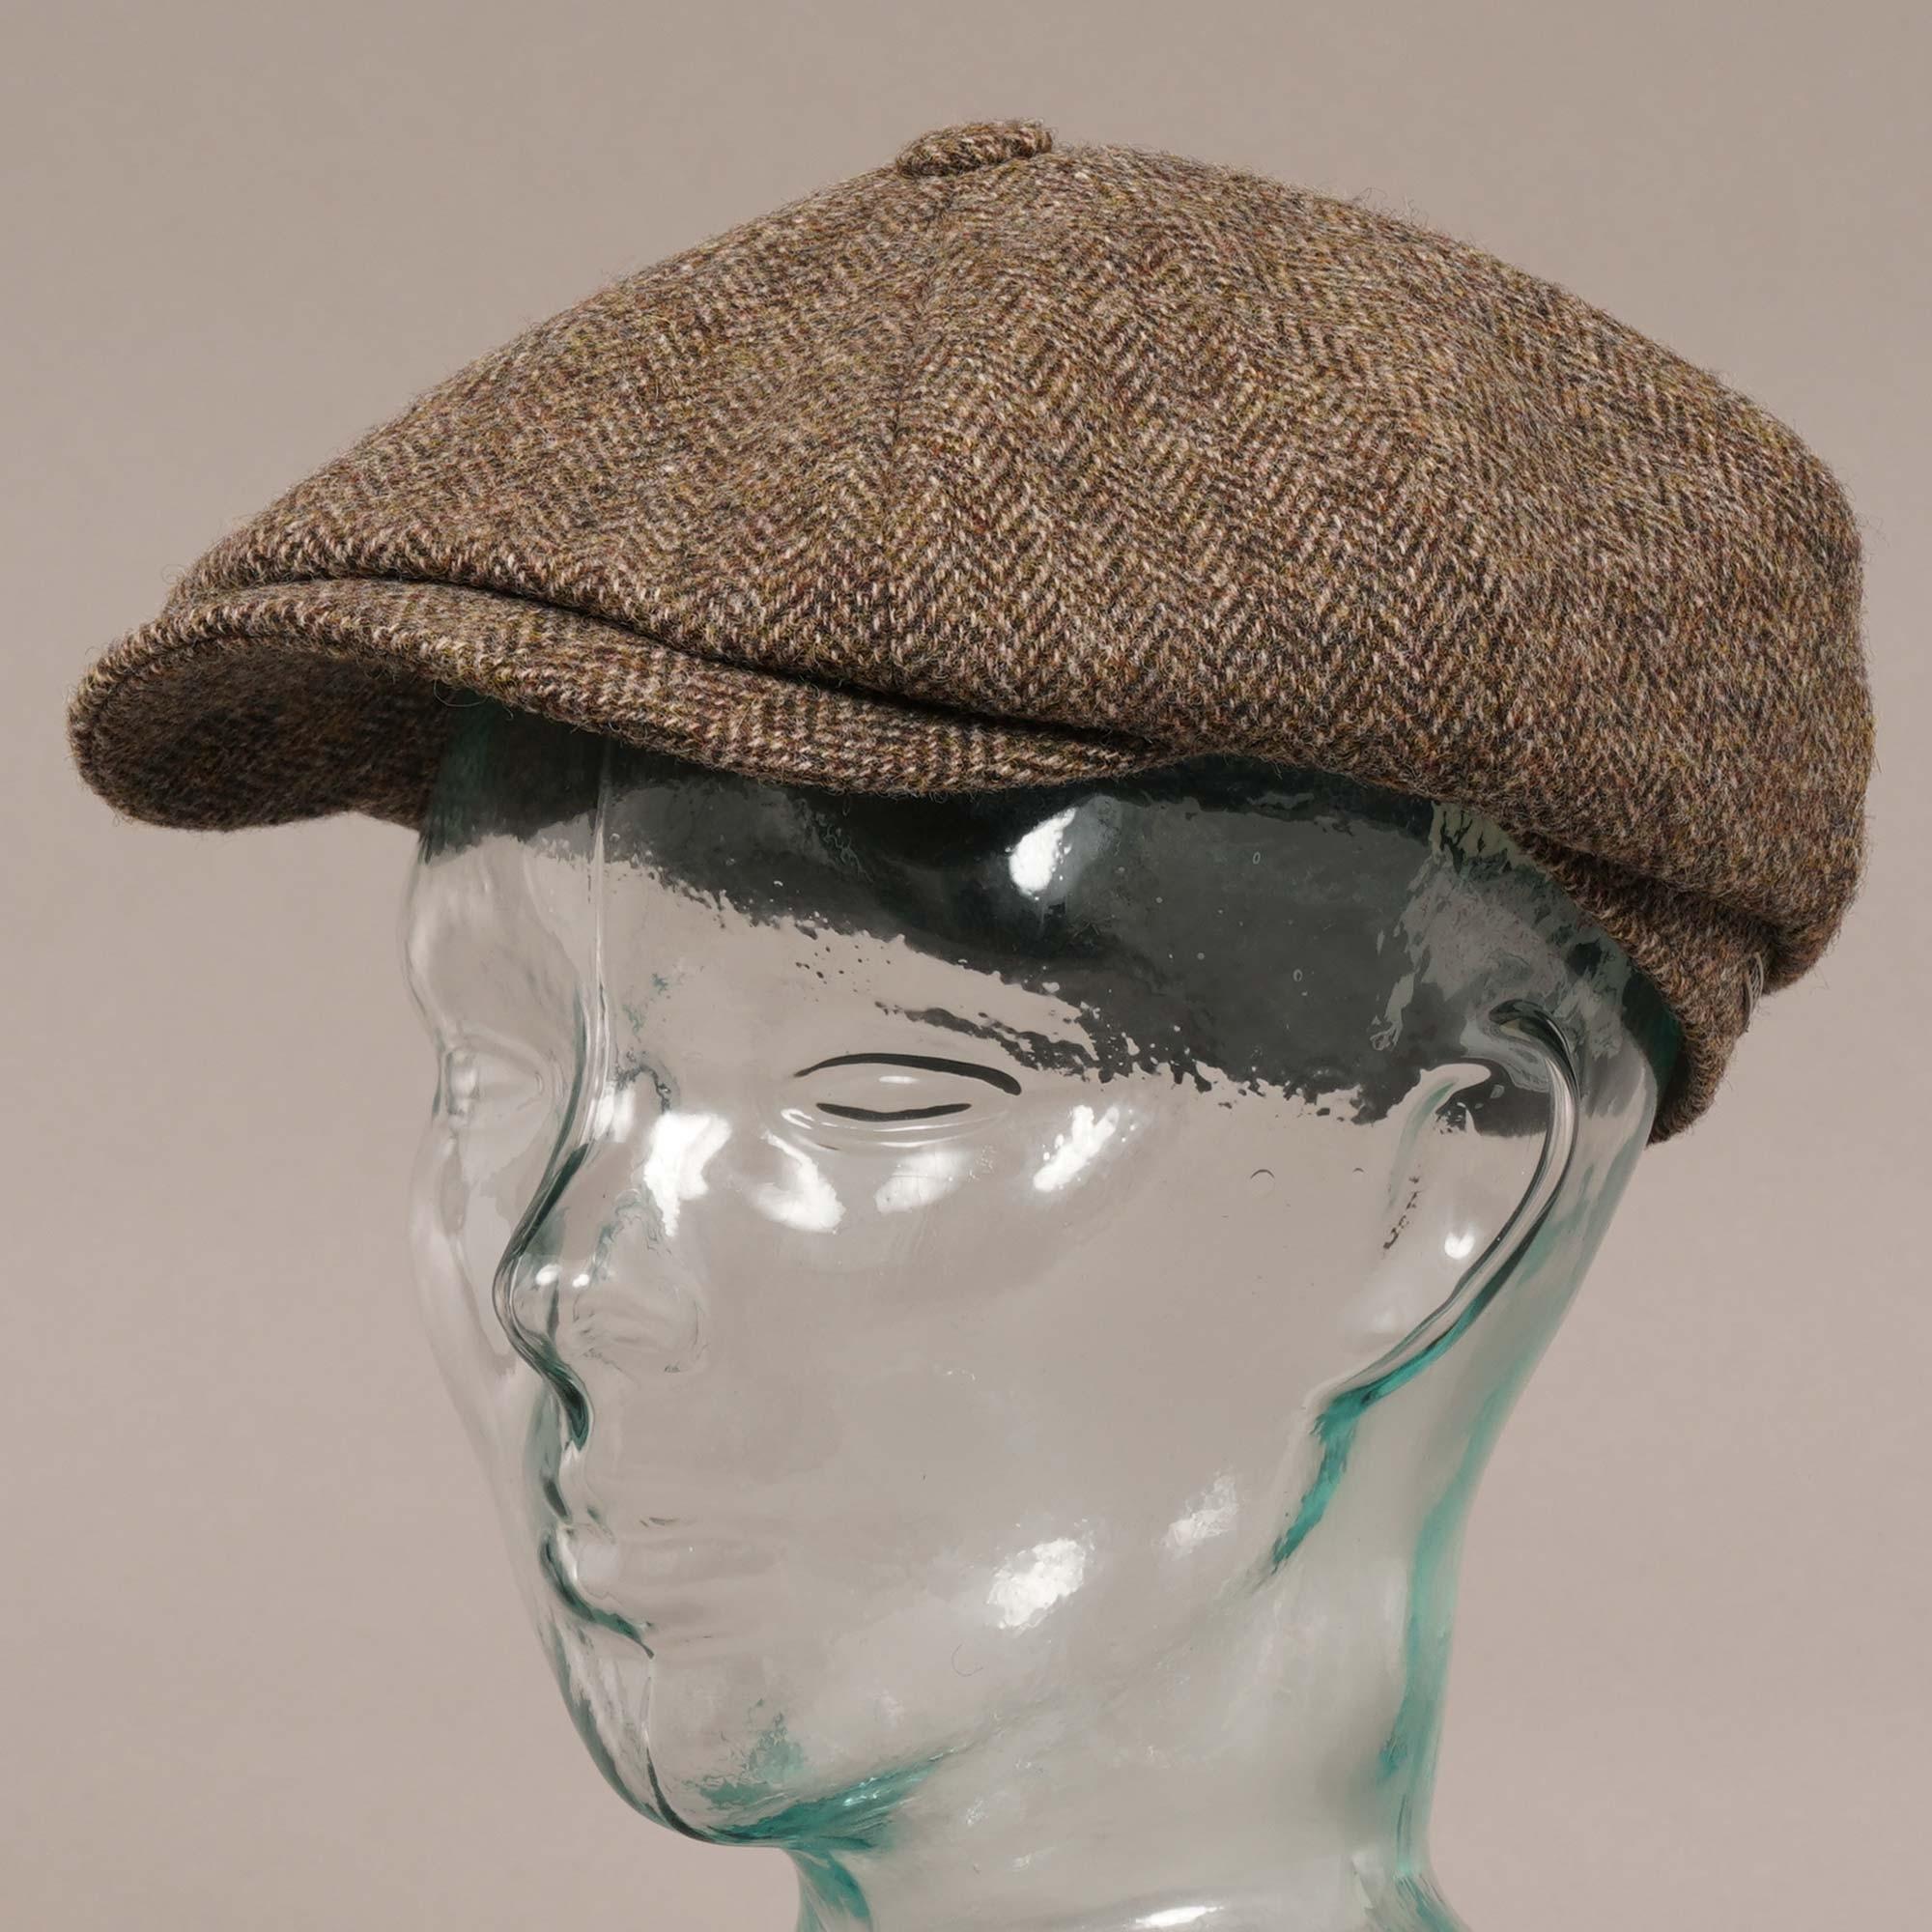 52f4e83b3 Stetson Hats Stetson Hatteras Woolrich Herringbone Brown Newsboy Hat  6840514 365